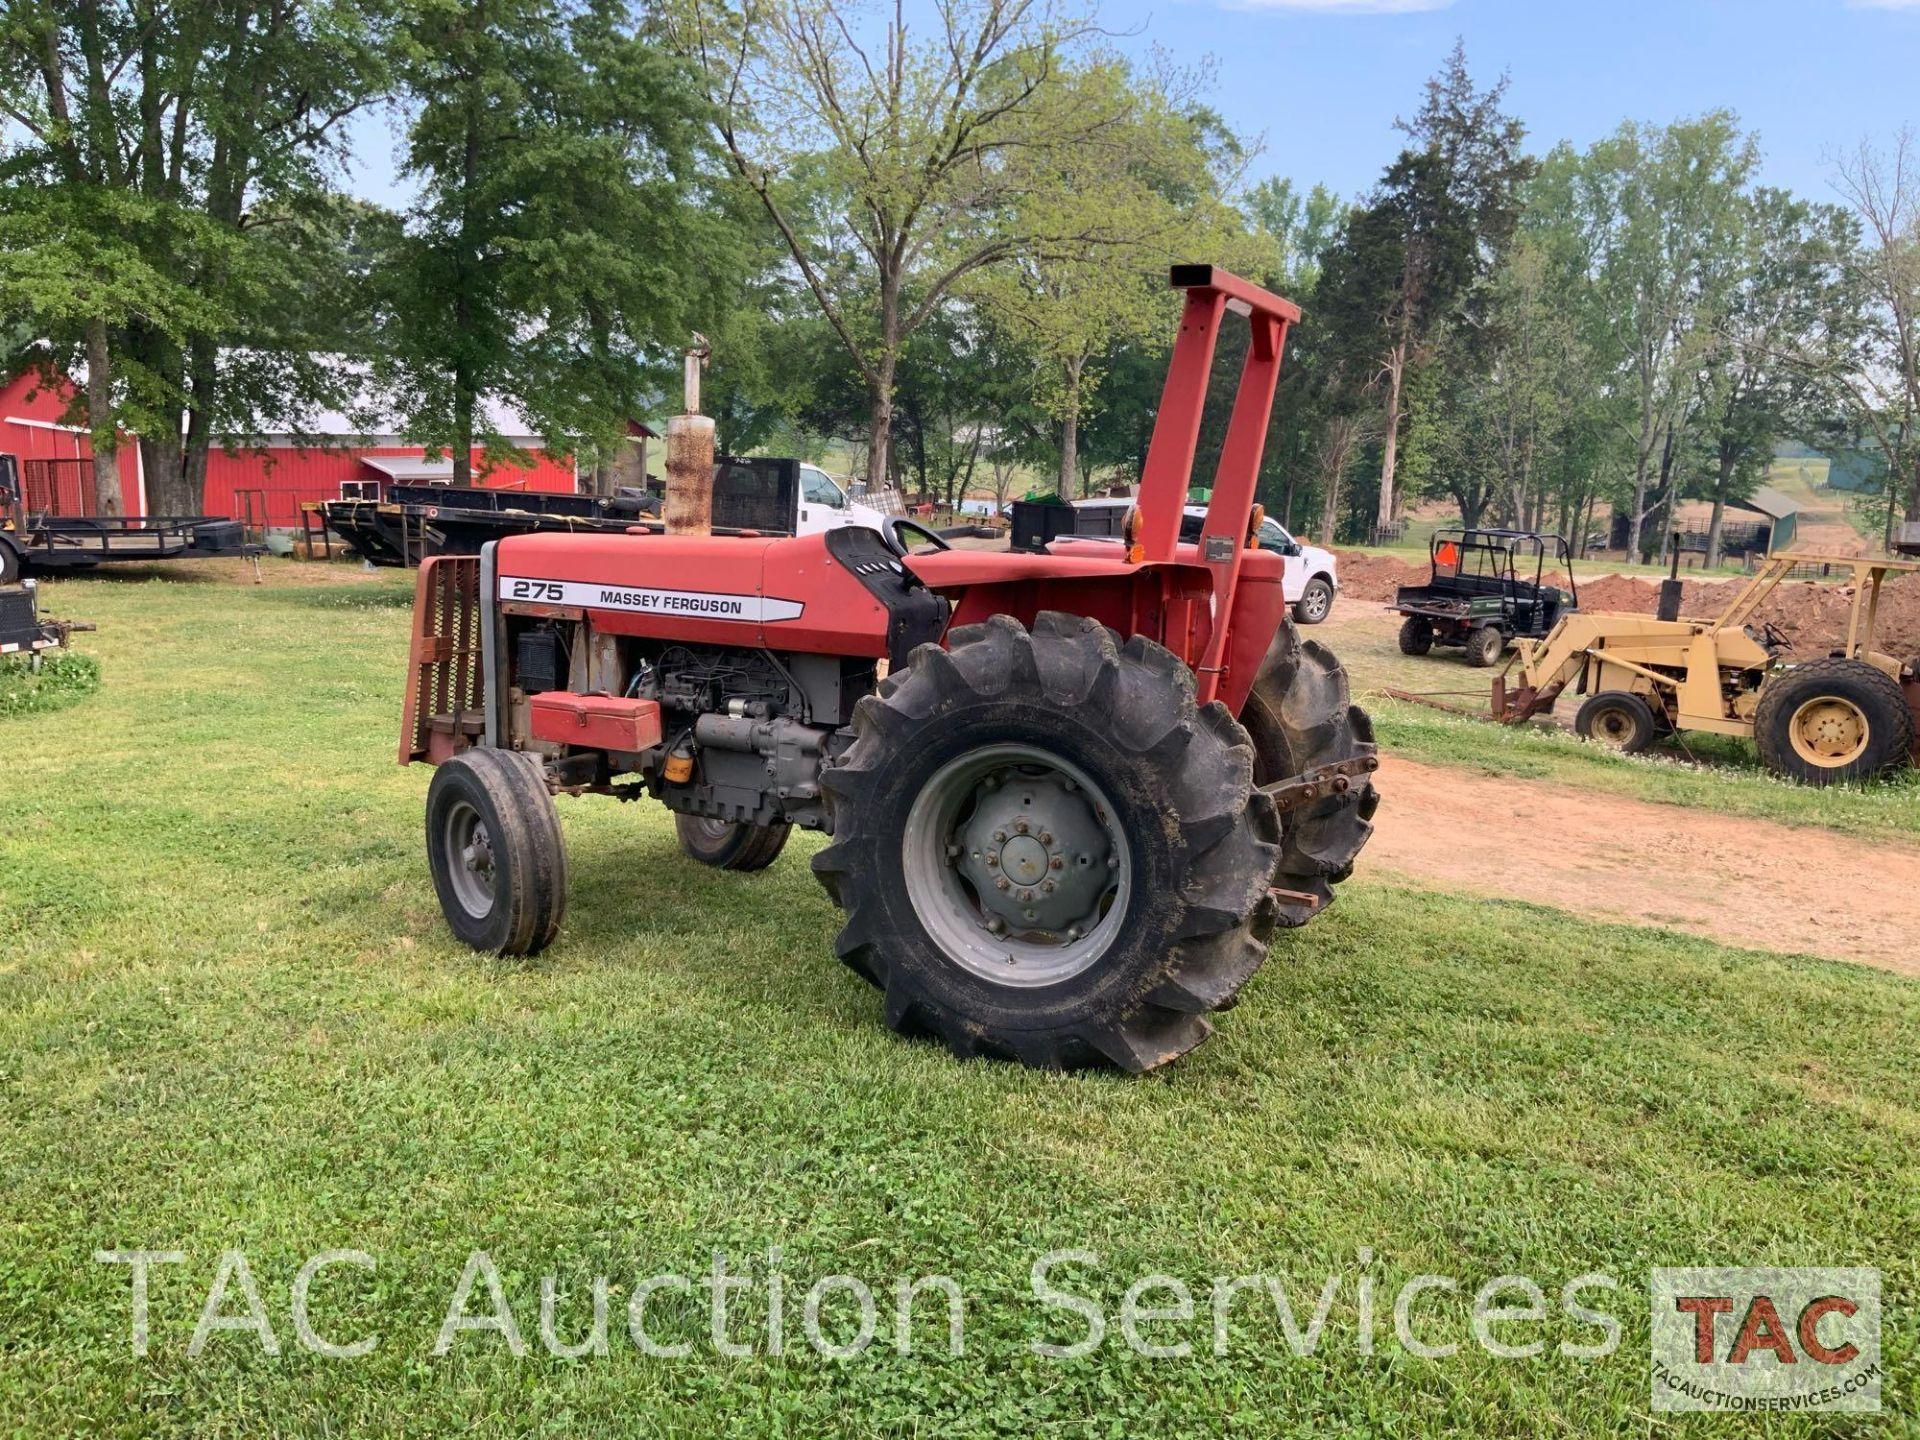 Massey Ferguson 275 Farm Tractor - Image 10 of 25